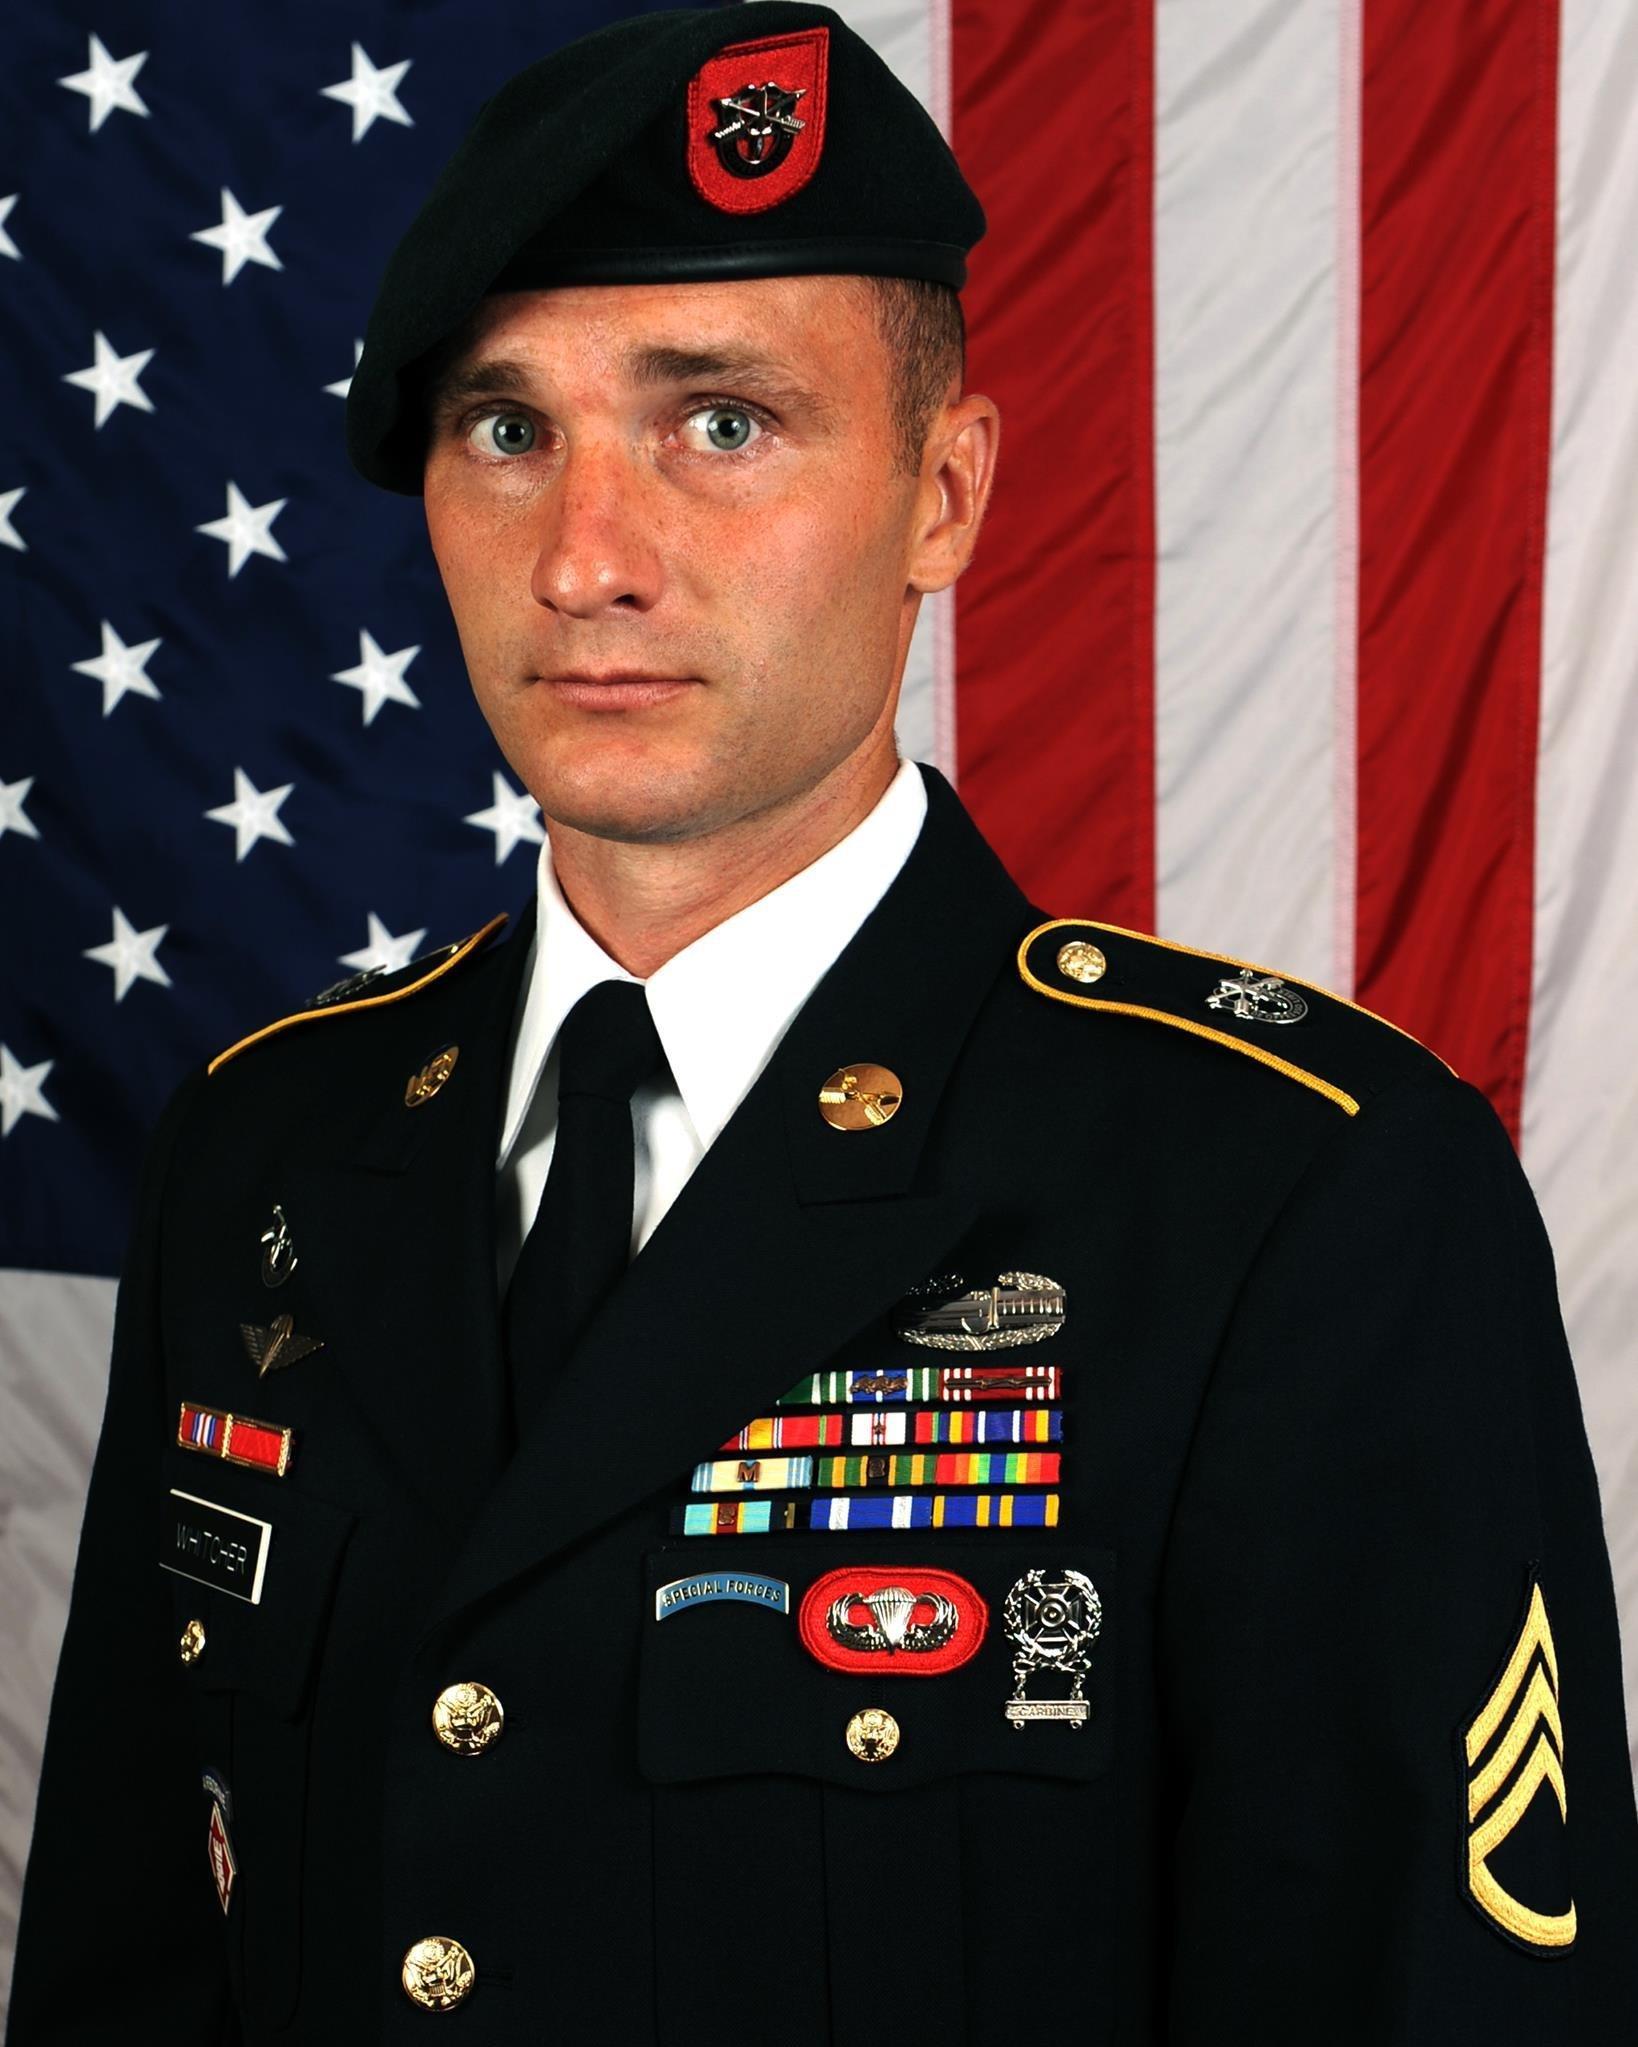 Staff Sgt. David J. Whitcher, 30, of Bradford, New Hampshire